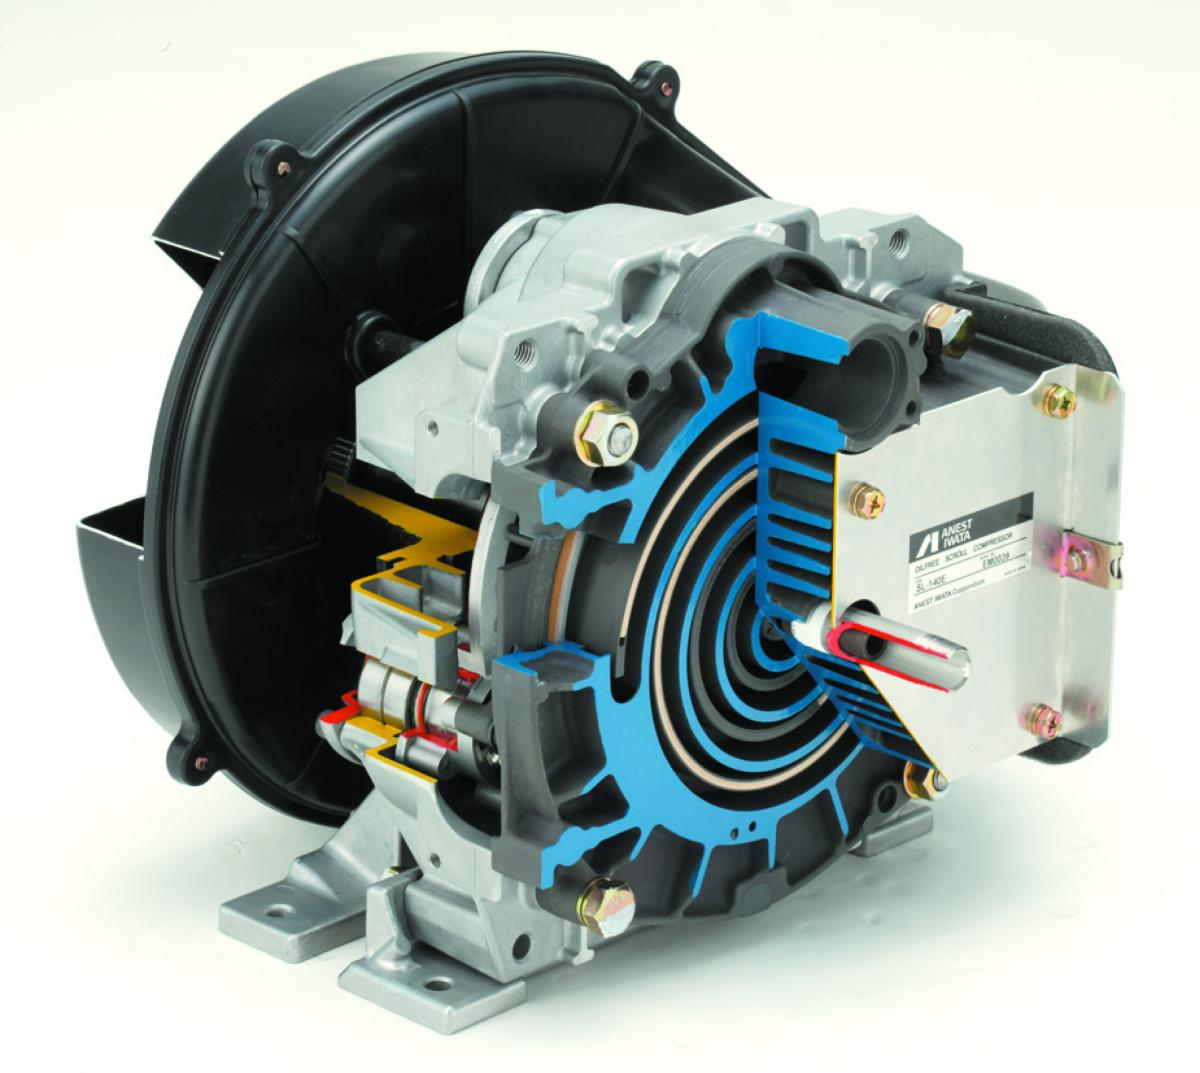 copeland discus wiring diagram pioneer deh p4200ub scroll